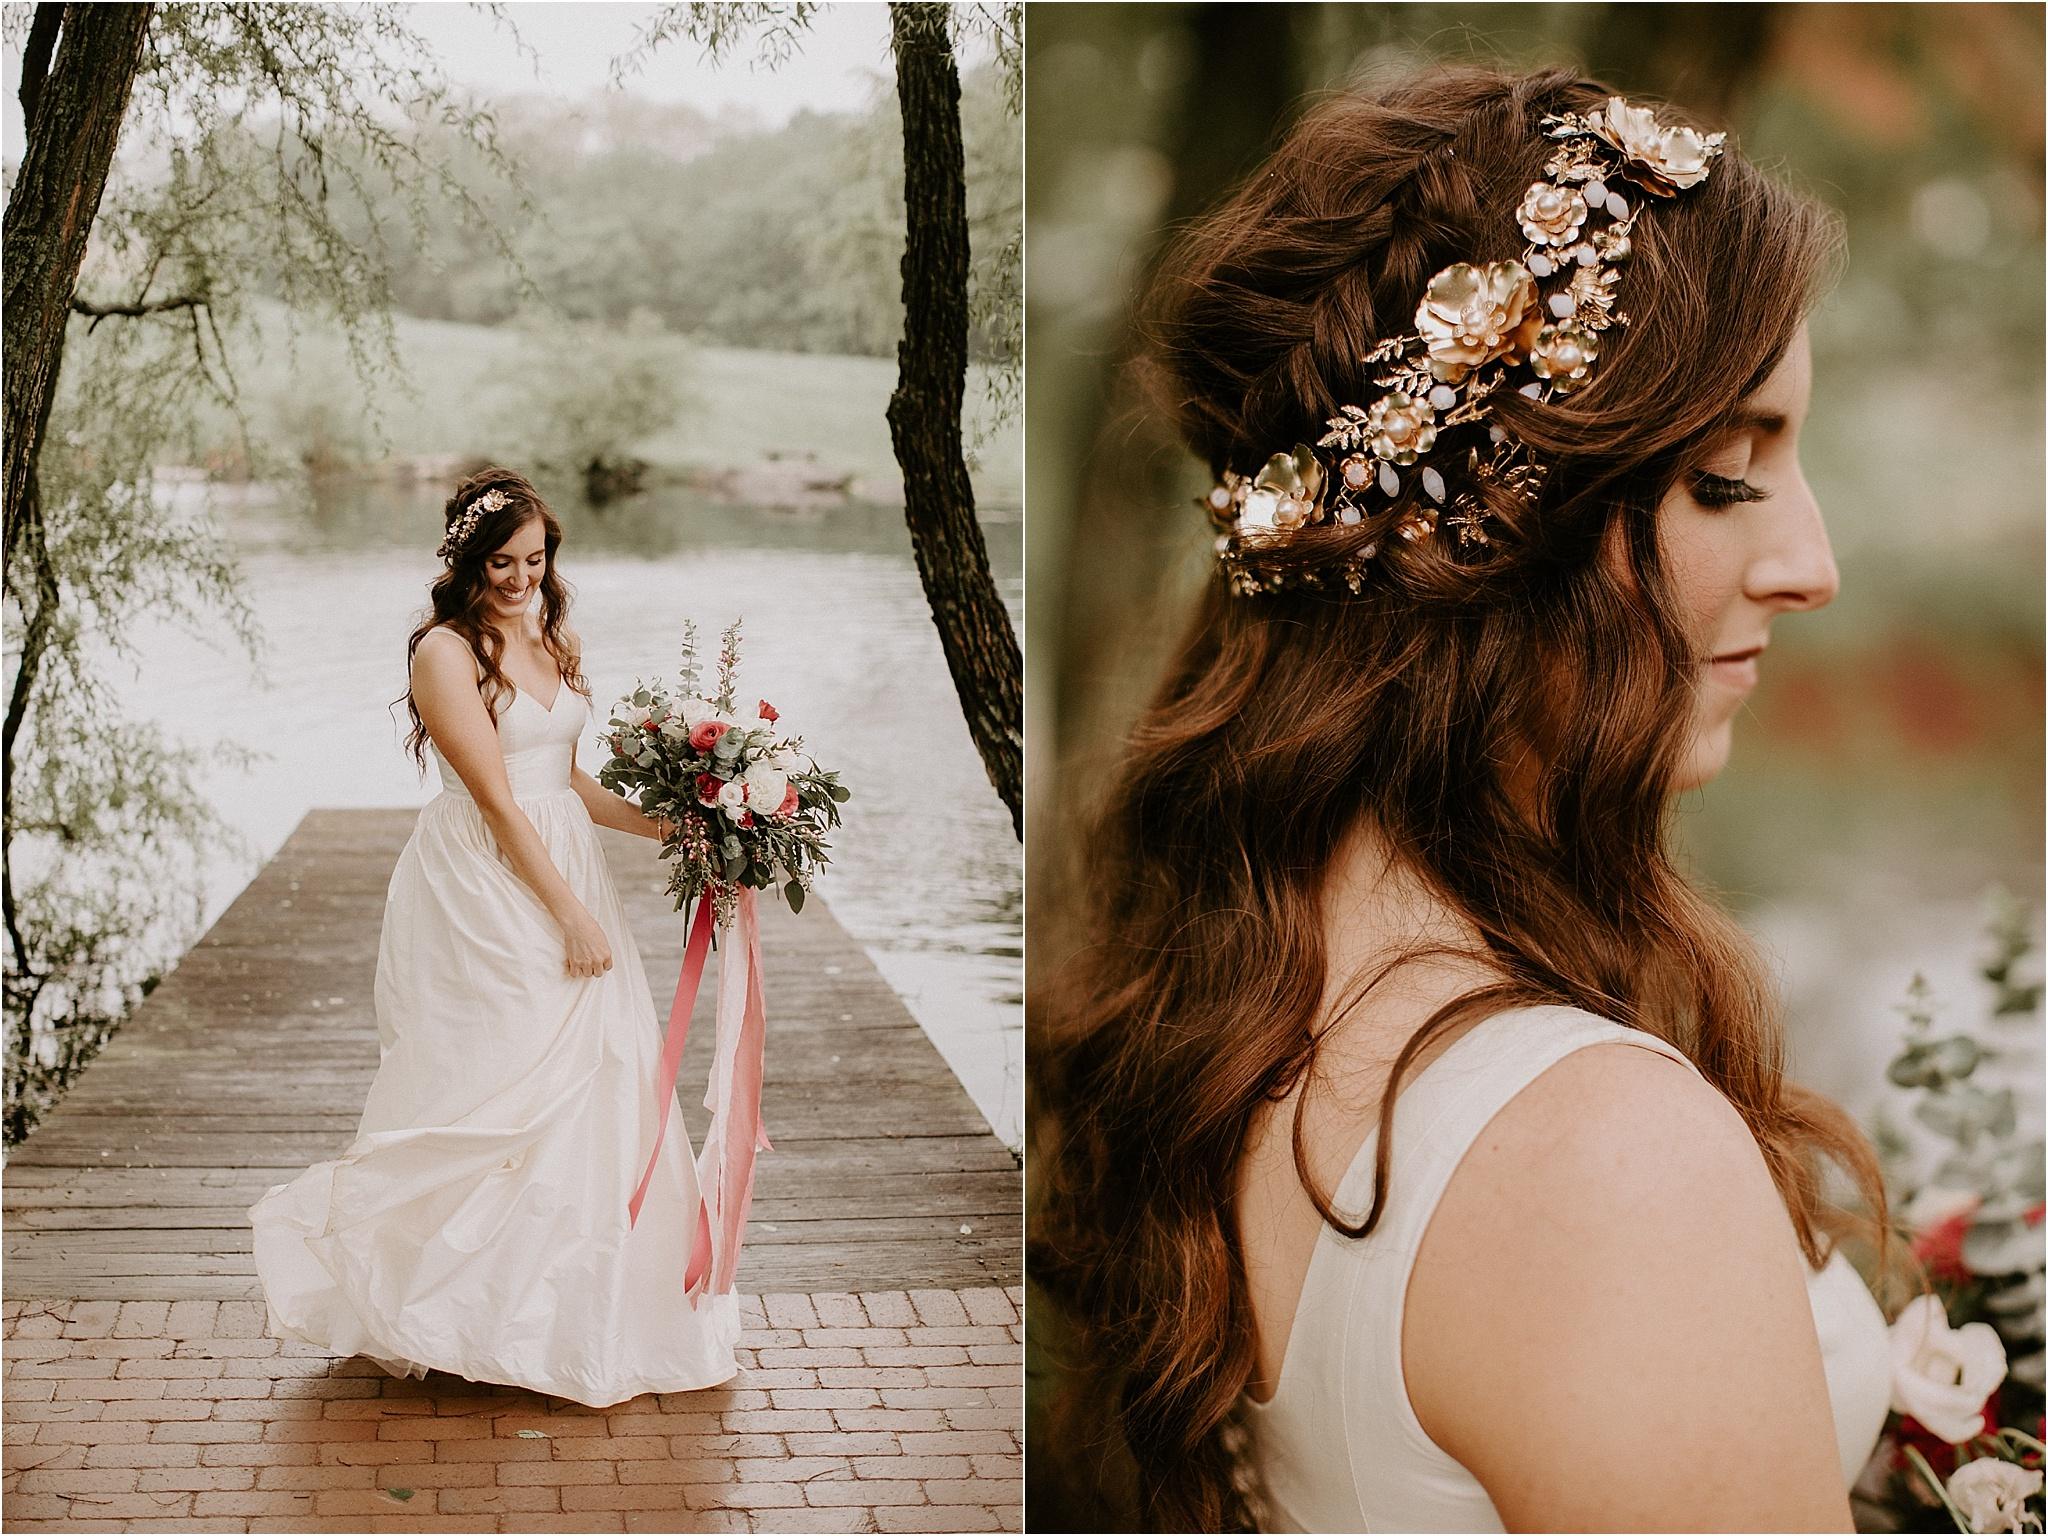 Sarah_Brookhart_Farm_at_Eagles_Ridge_Wedding_Photographer_0026.jpg